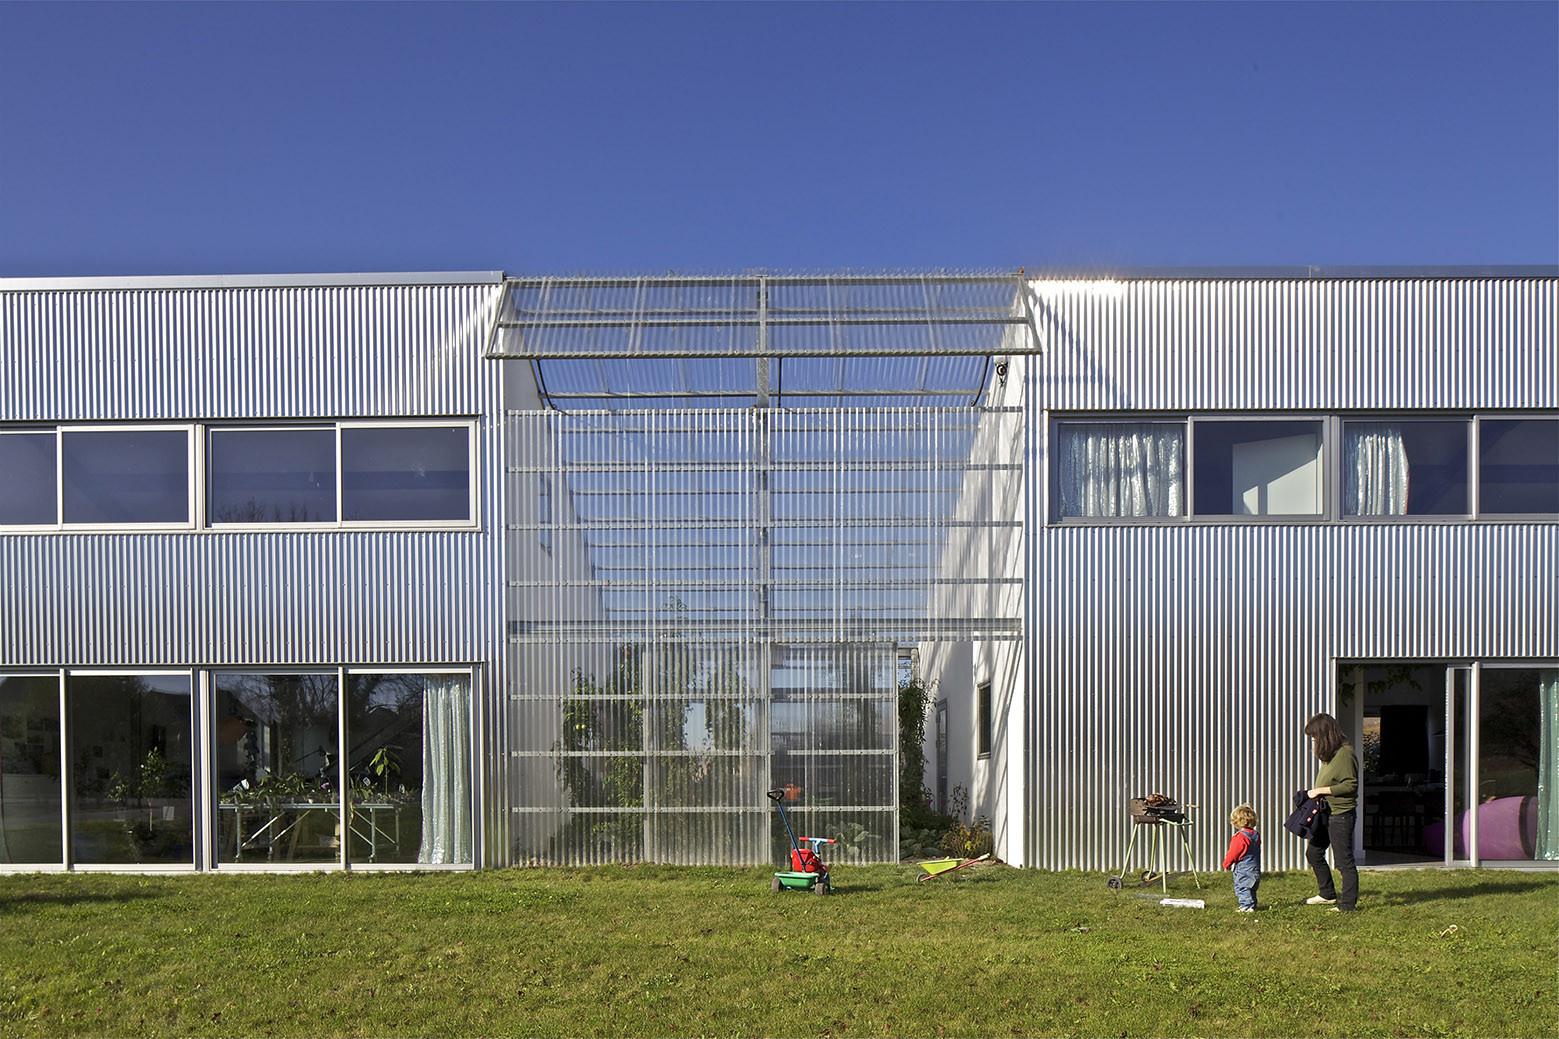 Maison + Agence / Hérard & da Costa, © Philippe Ruault